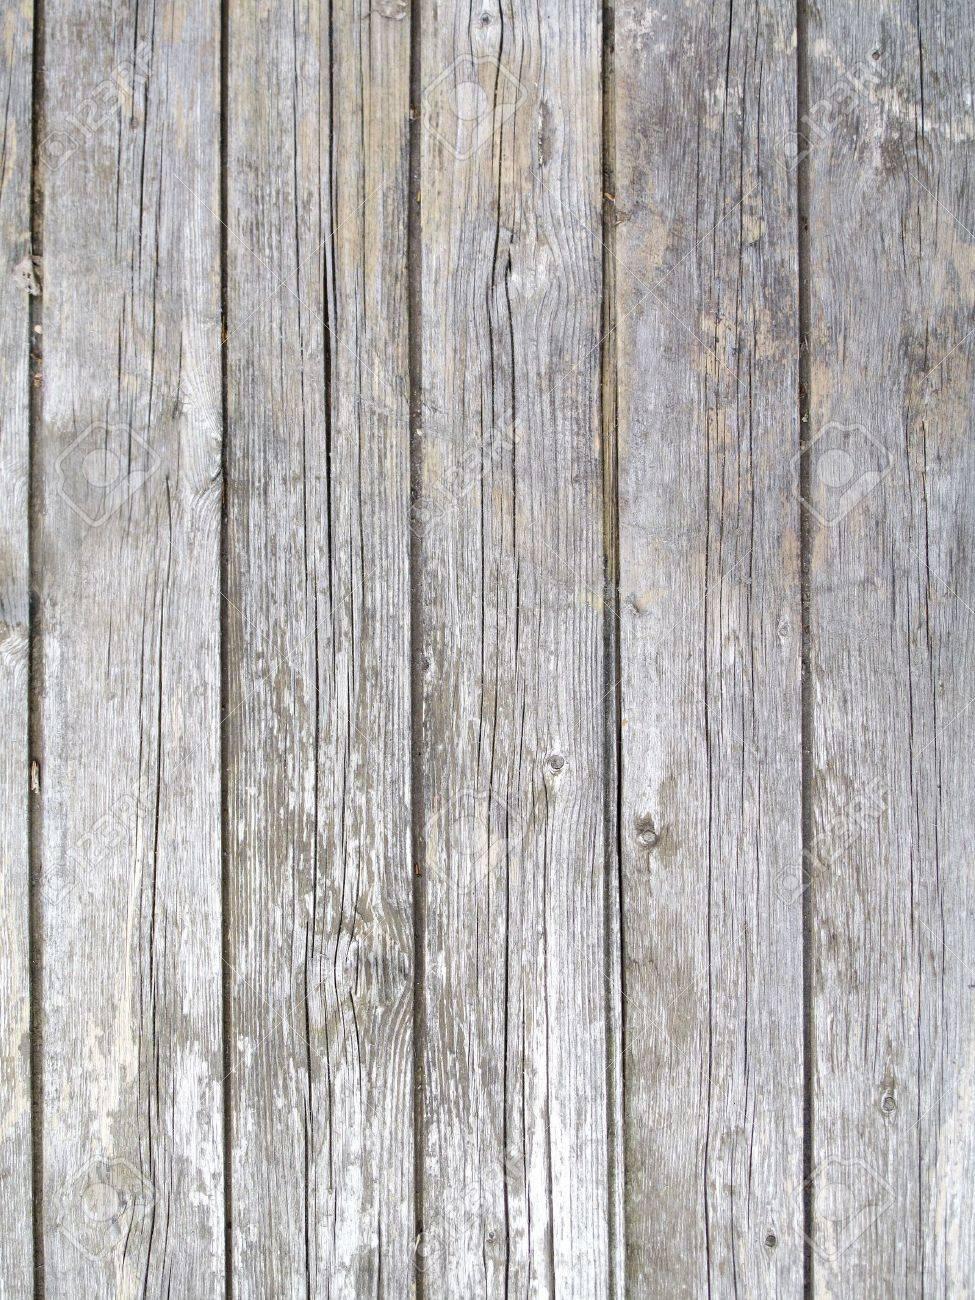 background grunge wood texture Stock Photo - 5624690